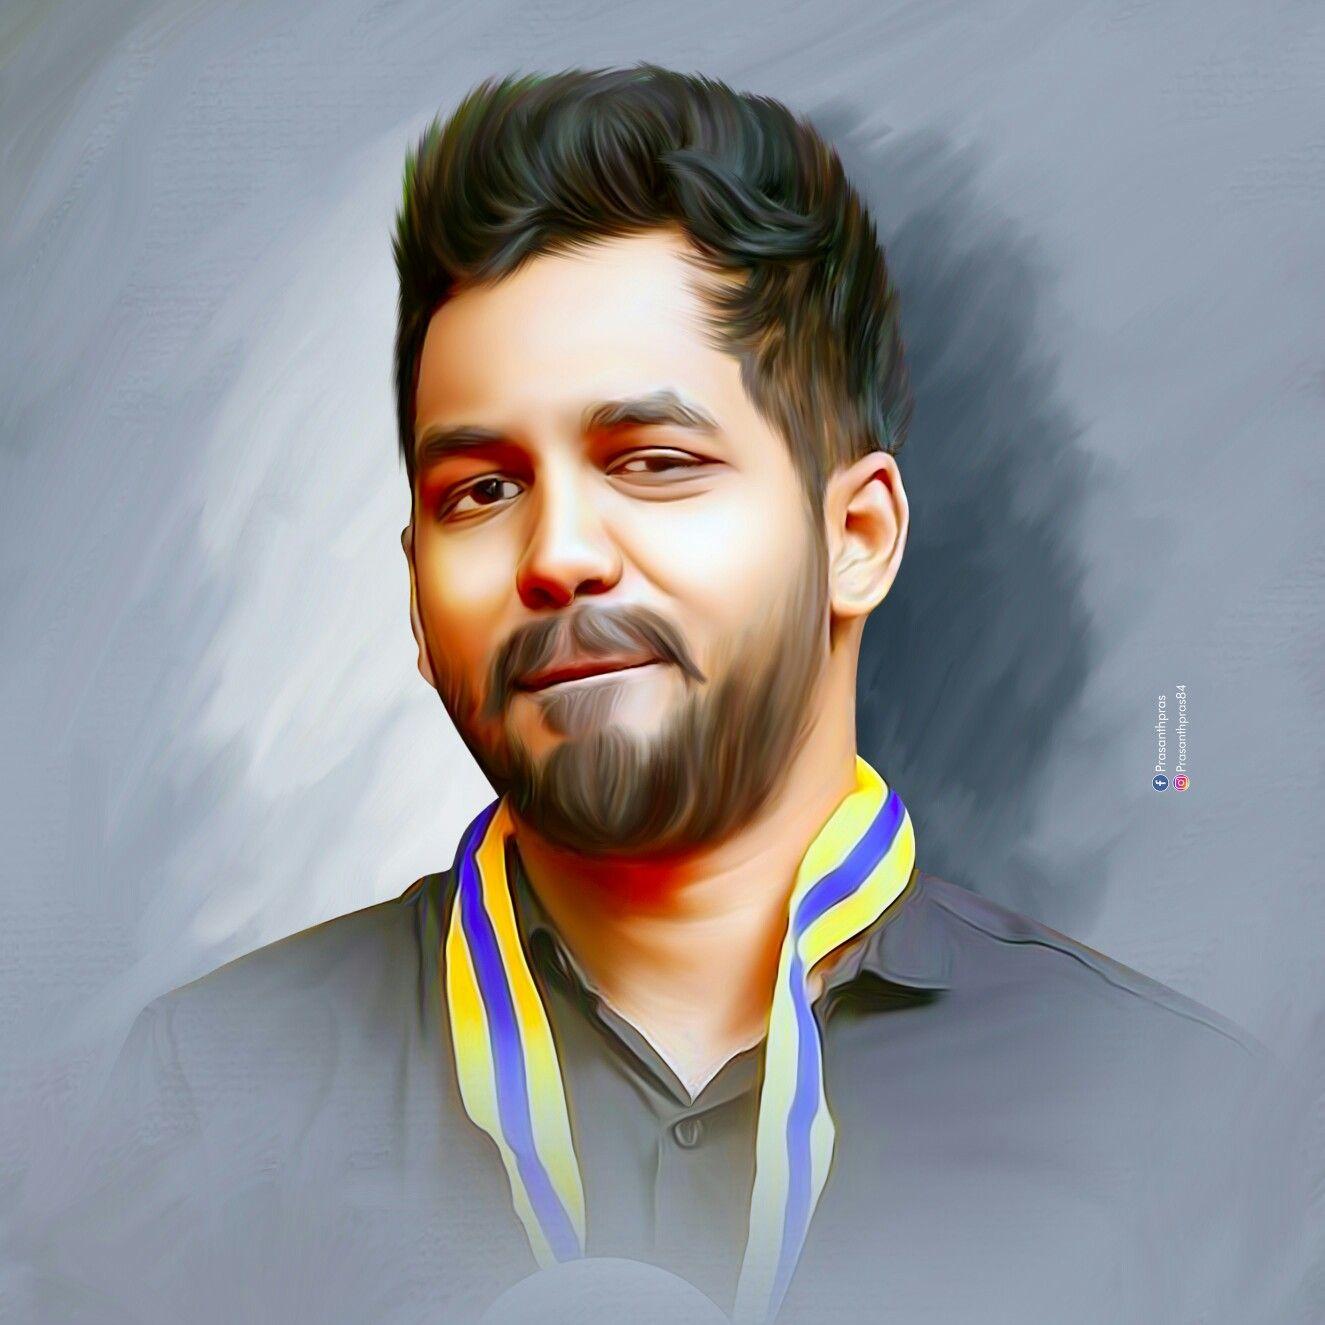 Hip Hop Tamizha Hiphoptamizha Aadhi Prasanthpras Digitalpainting Smudge Ps Portrait Art Digitalart Oil Hip Hop Images Hip Hop Cute Love Cartoons Hip hop tamizha full hd images download